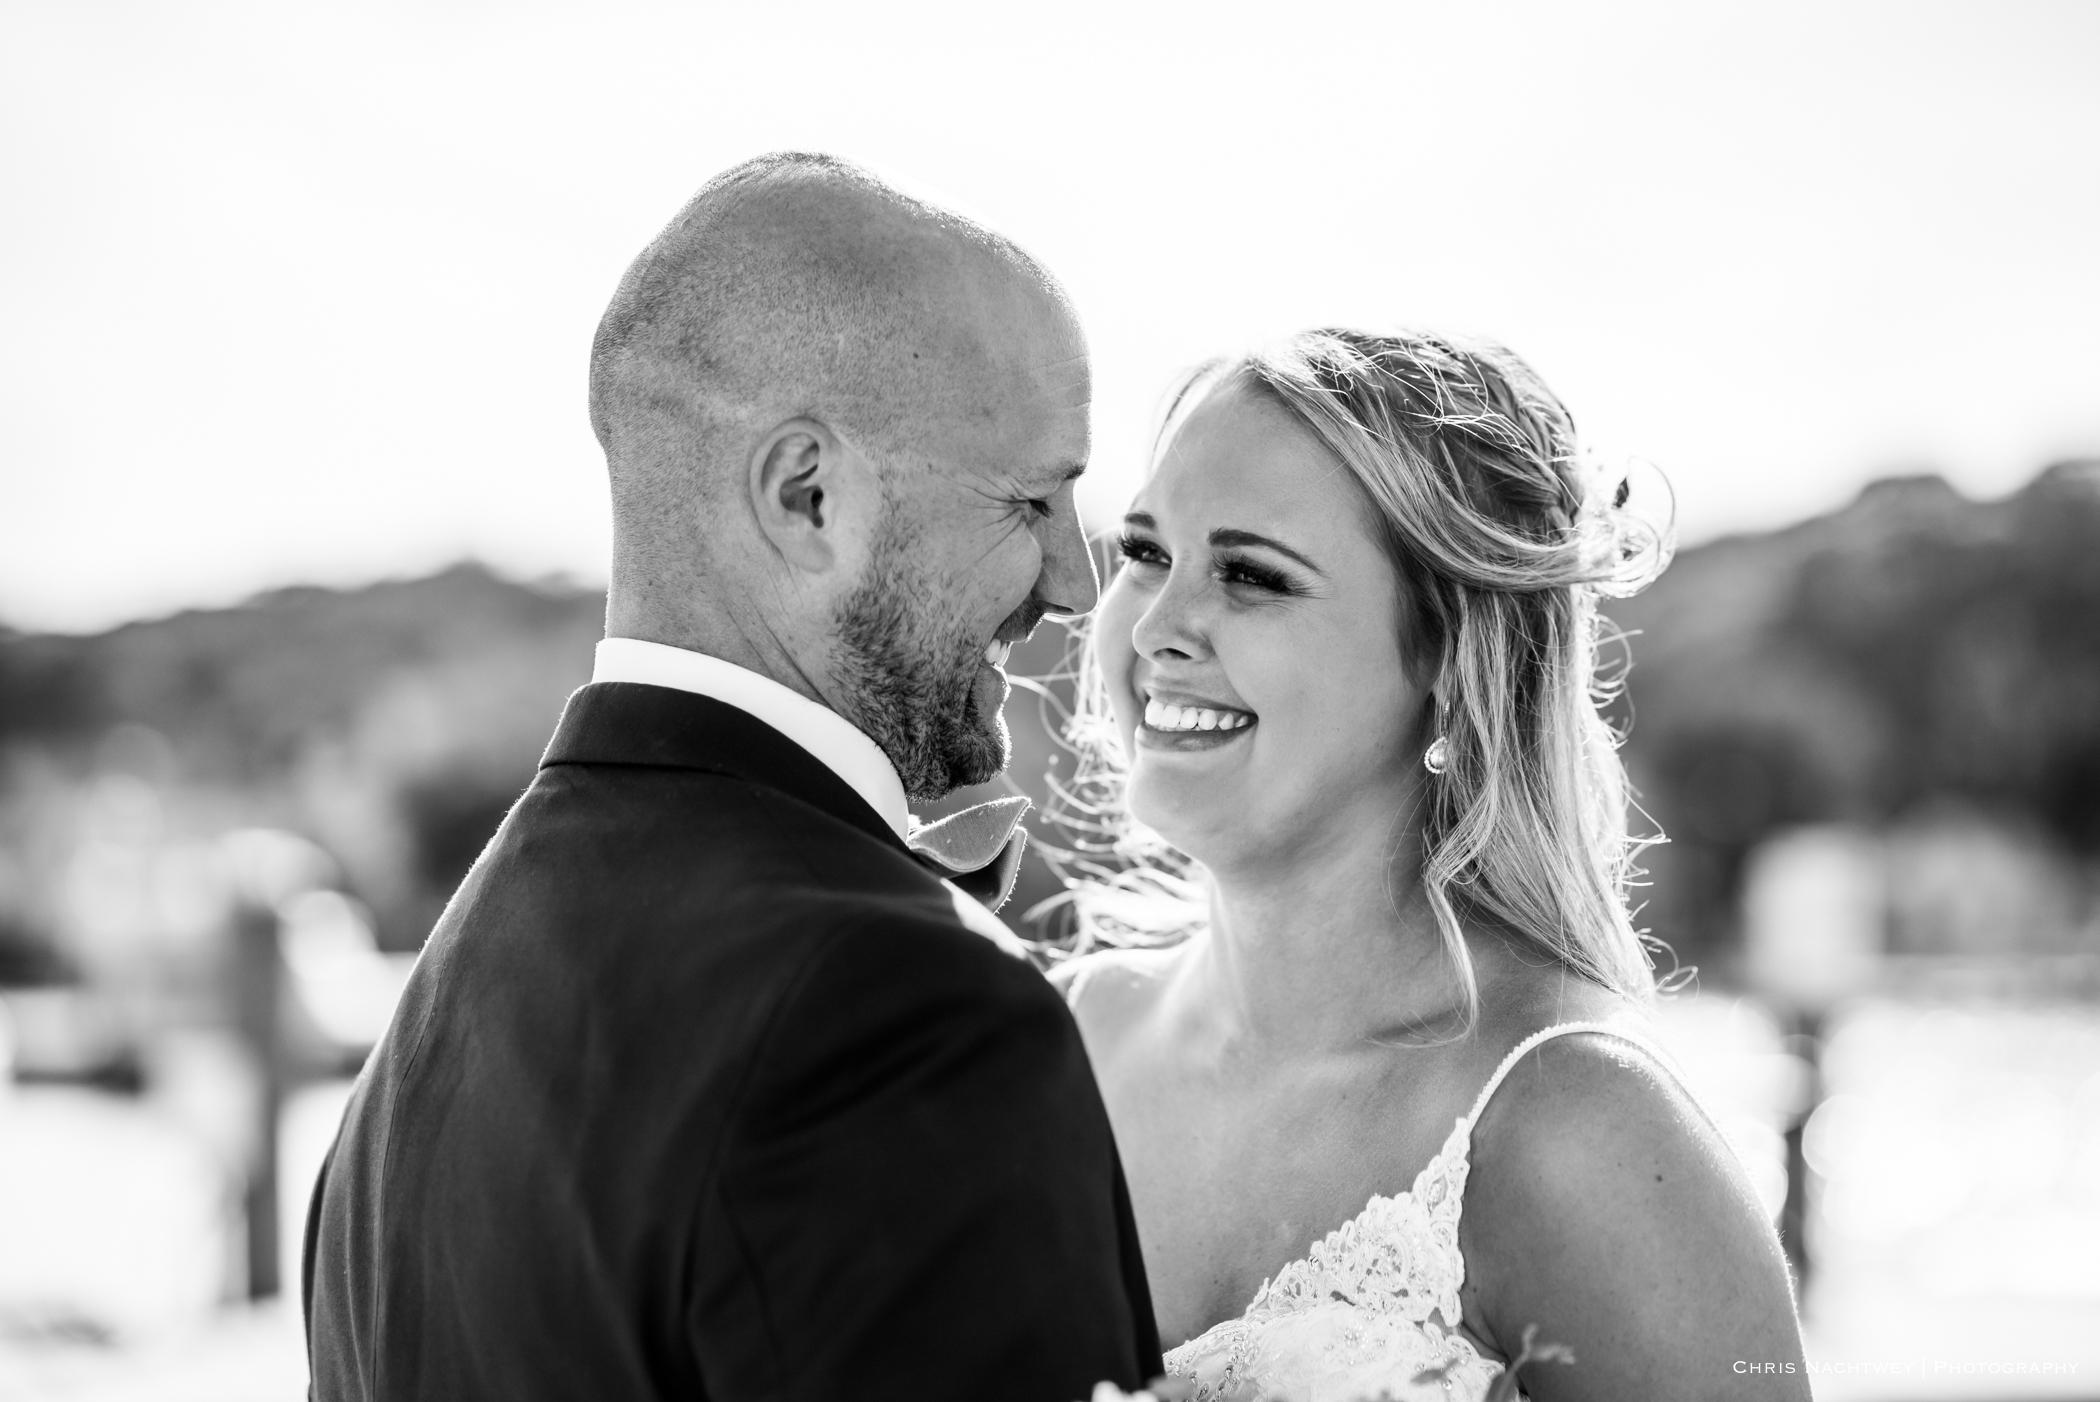 mystic-ct-artistic-wedding-photographers-chris-nachtwey-tany-mike-2017-17.jpg